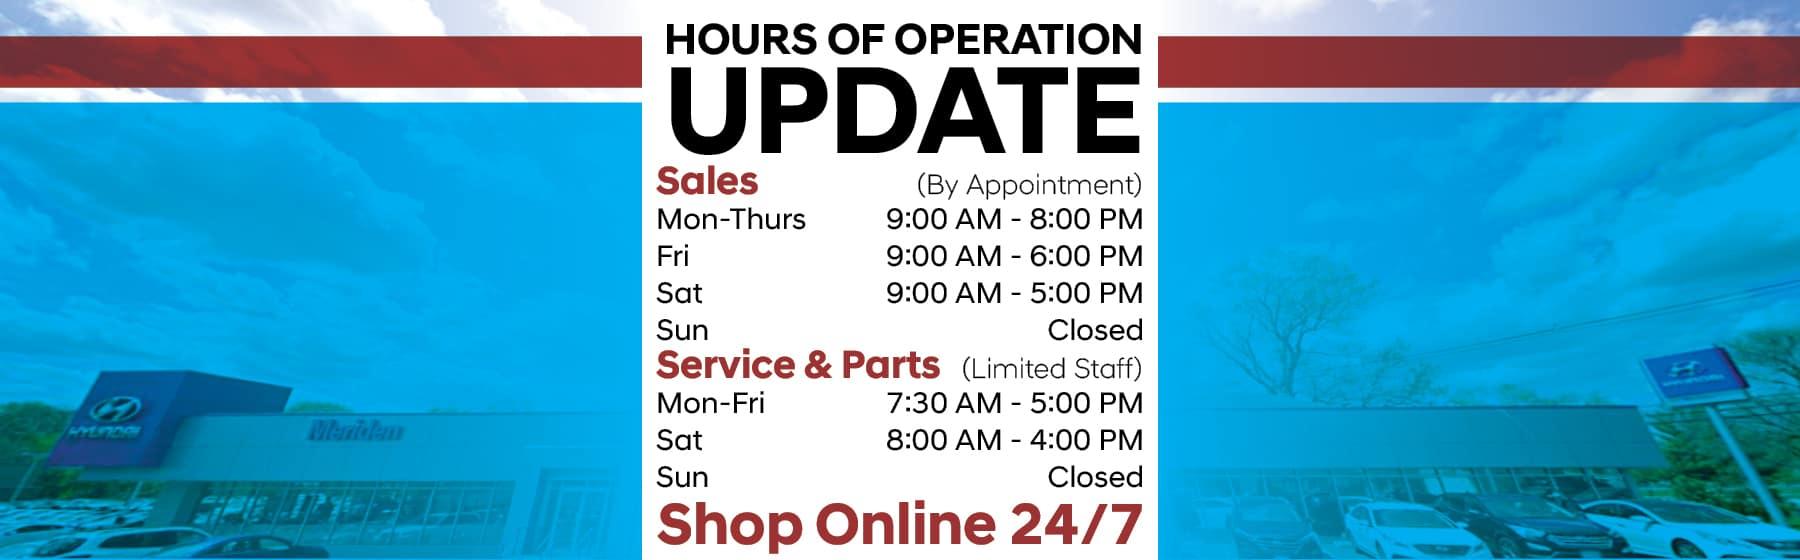 r1_MH_HP_Hours_Update_Jun20